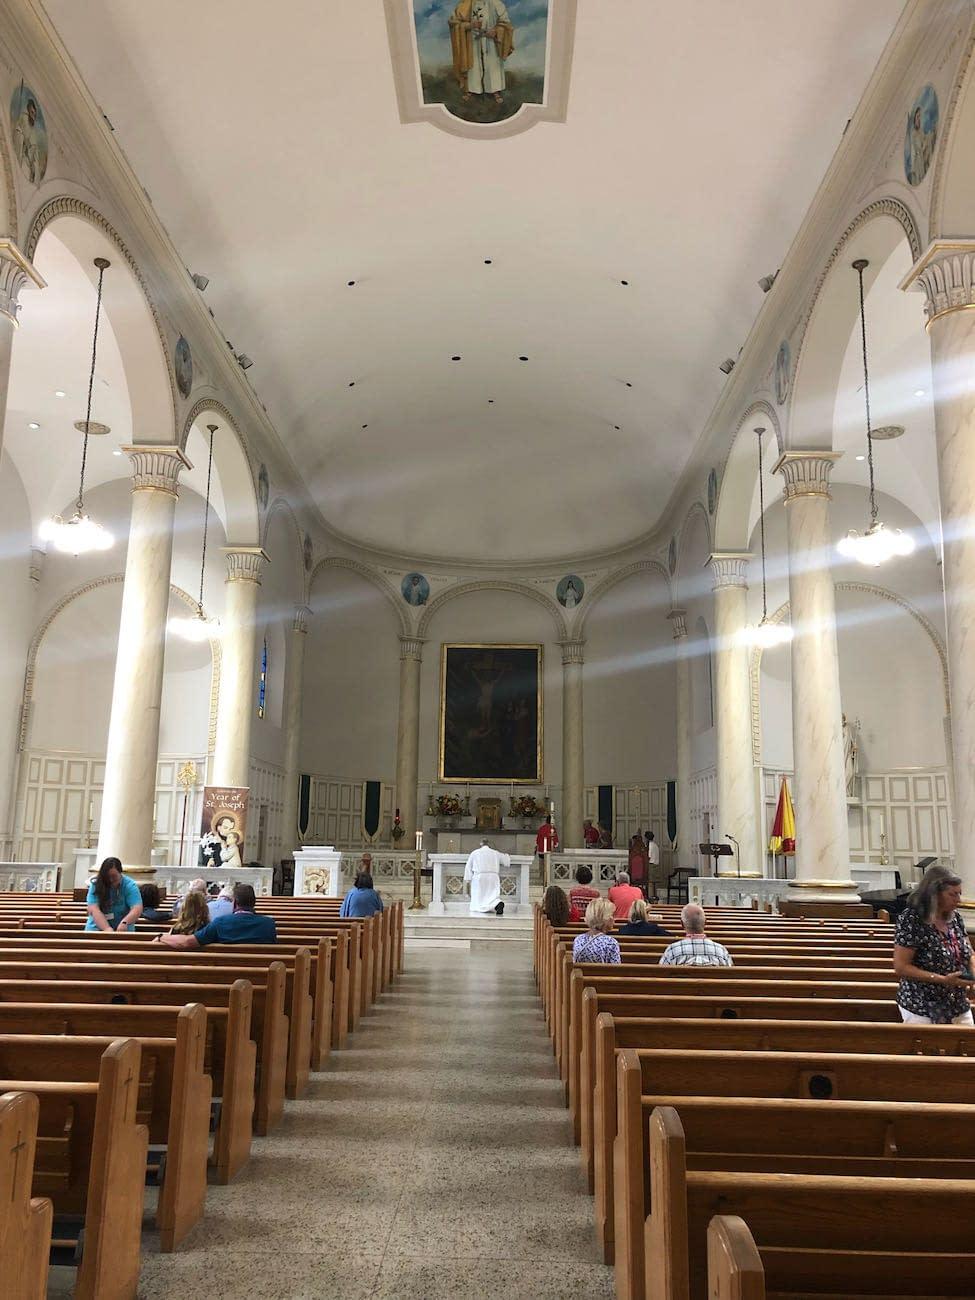 Interior of St. Joseph from Rear